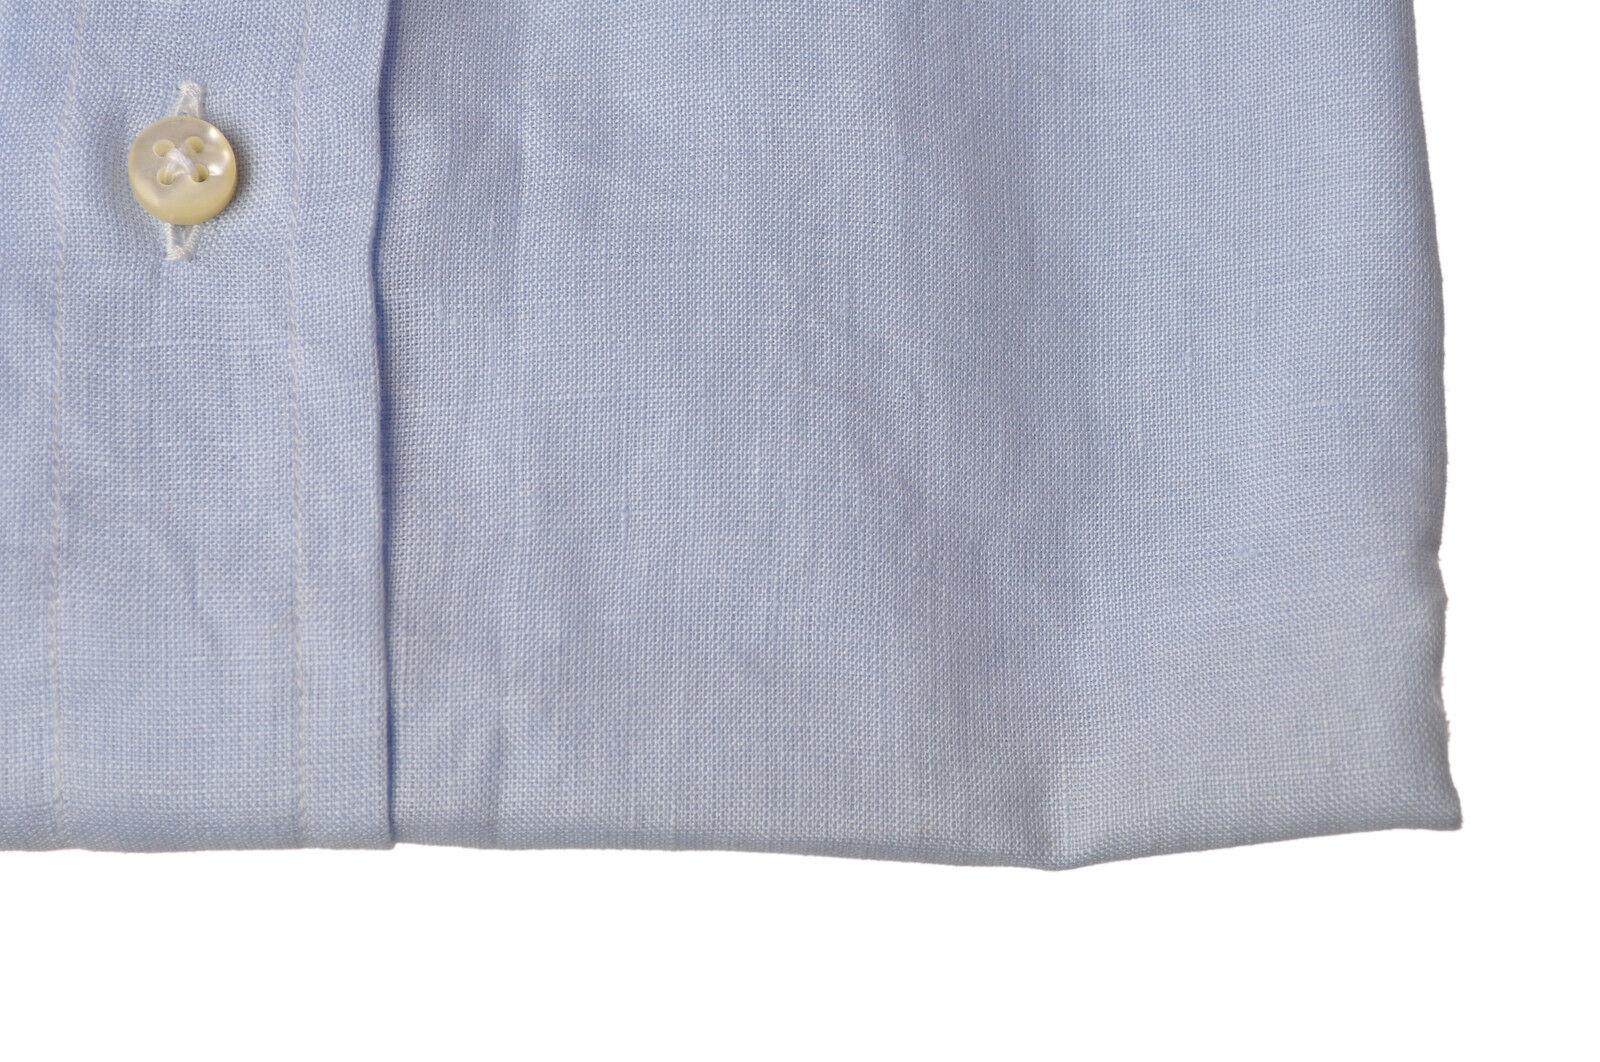 Liberty Rose - Shirts-Shirt - Man - - blu - Man 3465217D184541 fc5db3